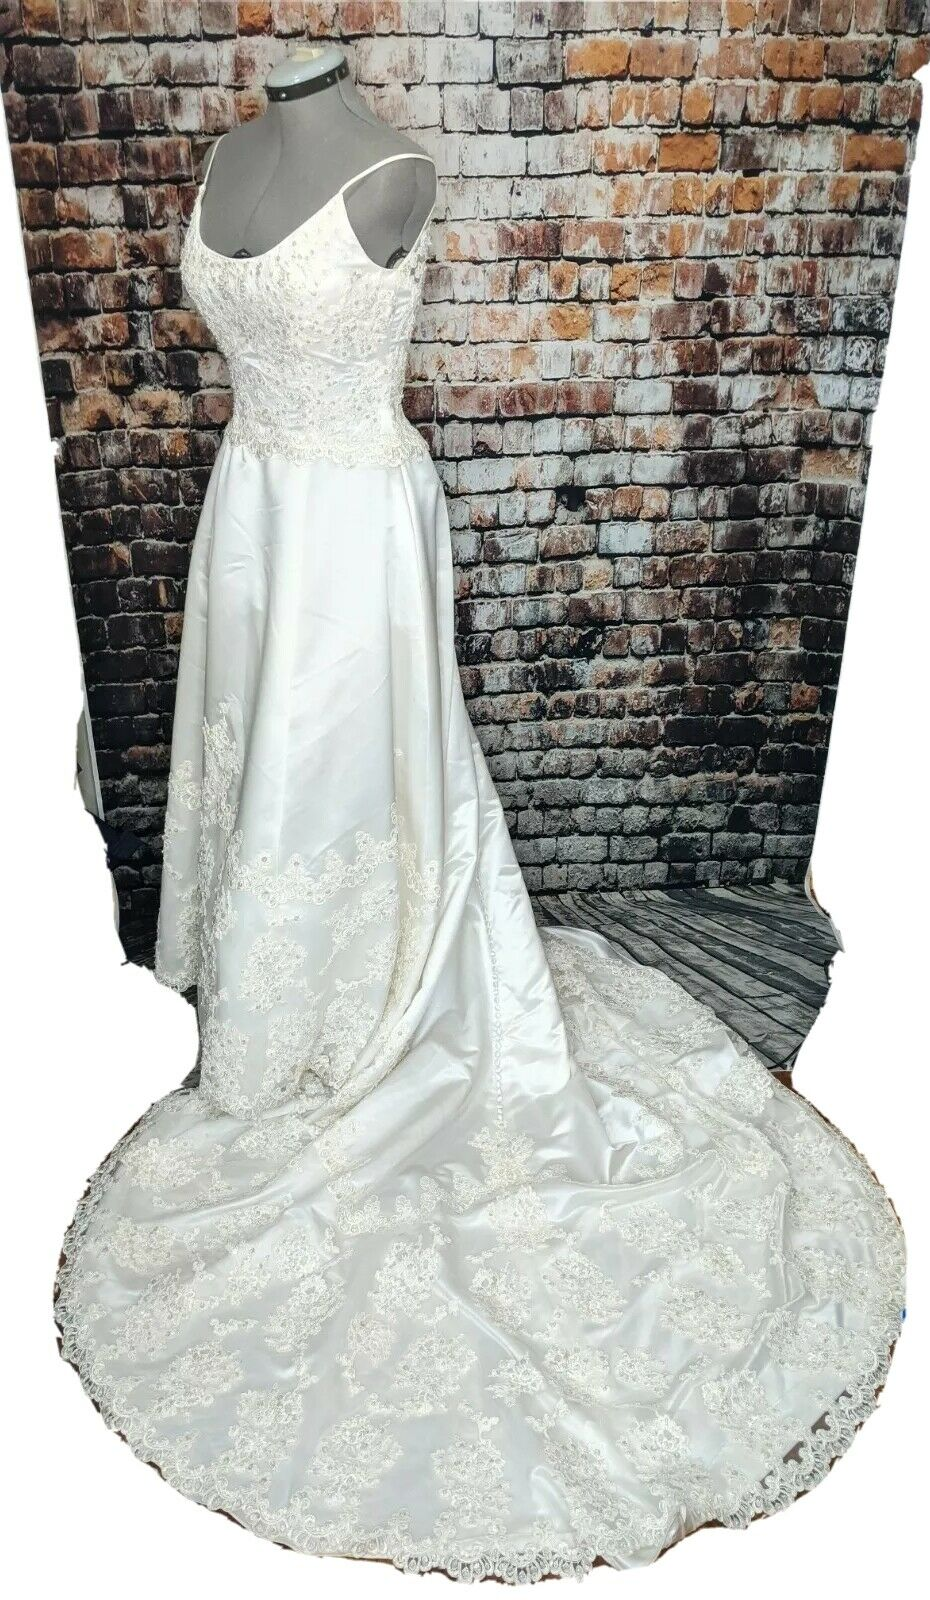 GLORIA VANDERBILT Beaded Lace Sequin Train Wedding Dress 14 White David's Bridal